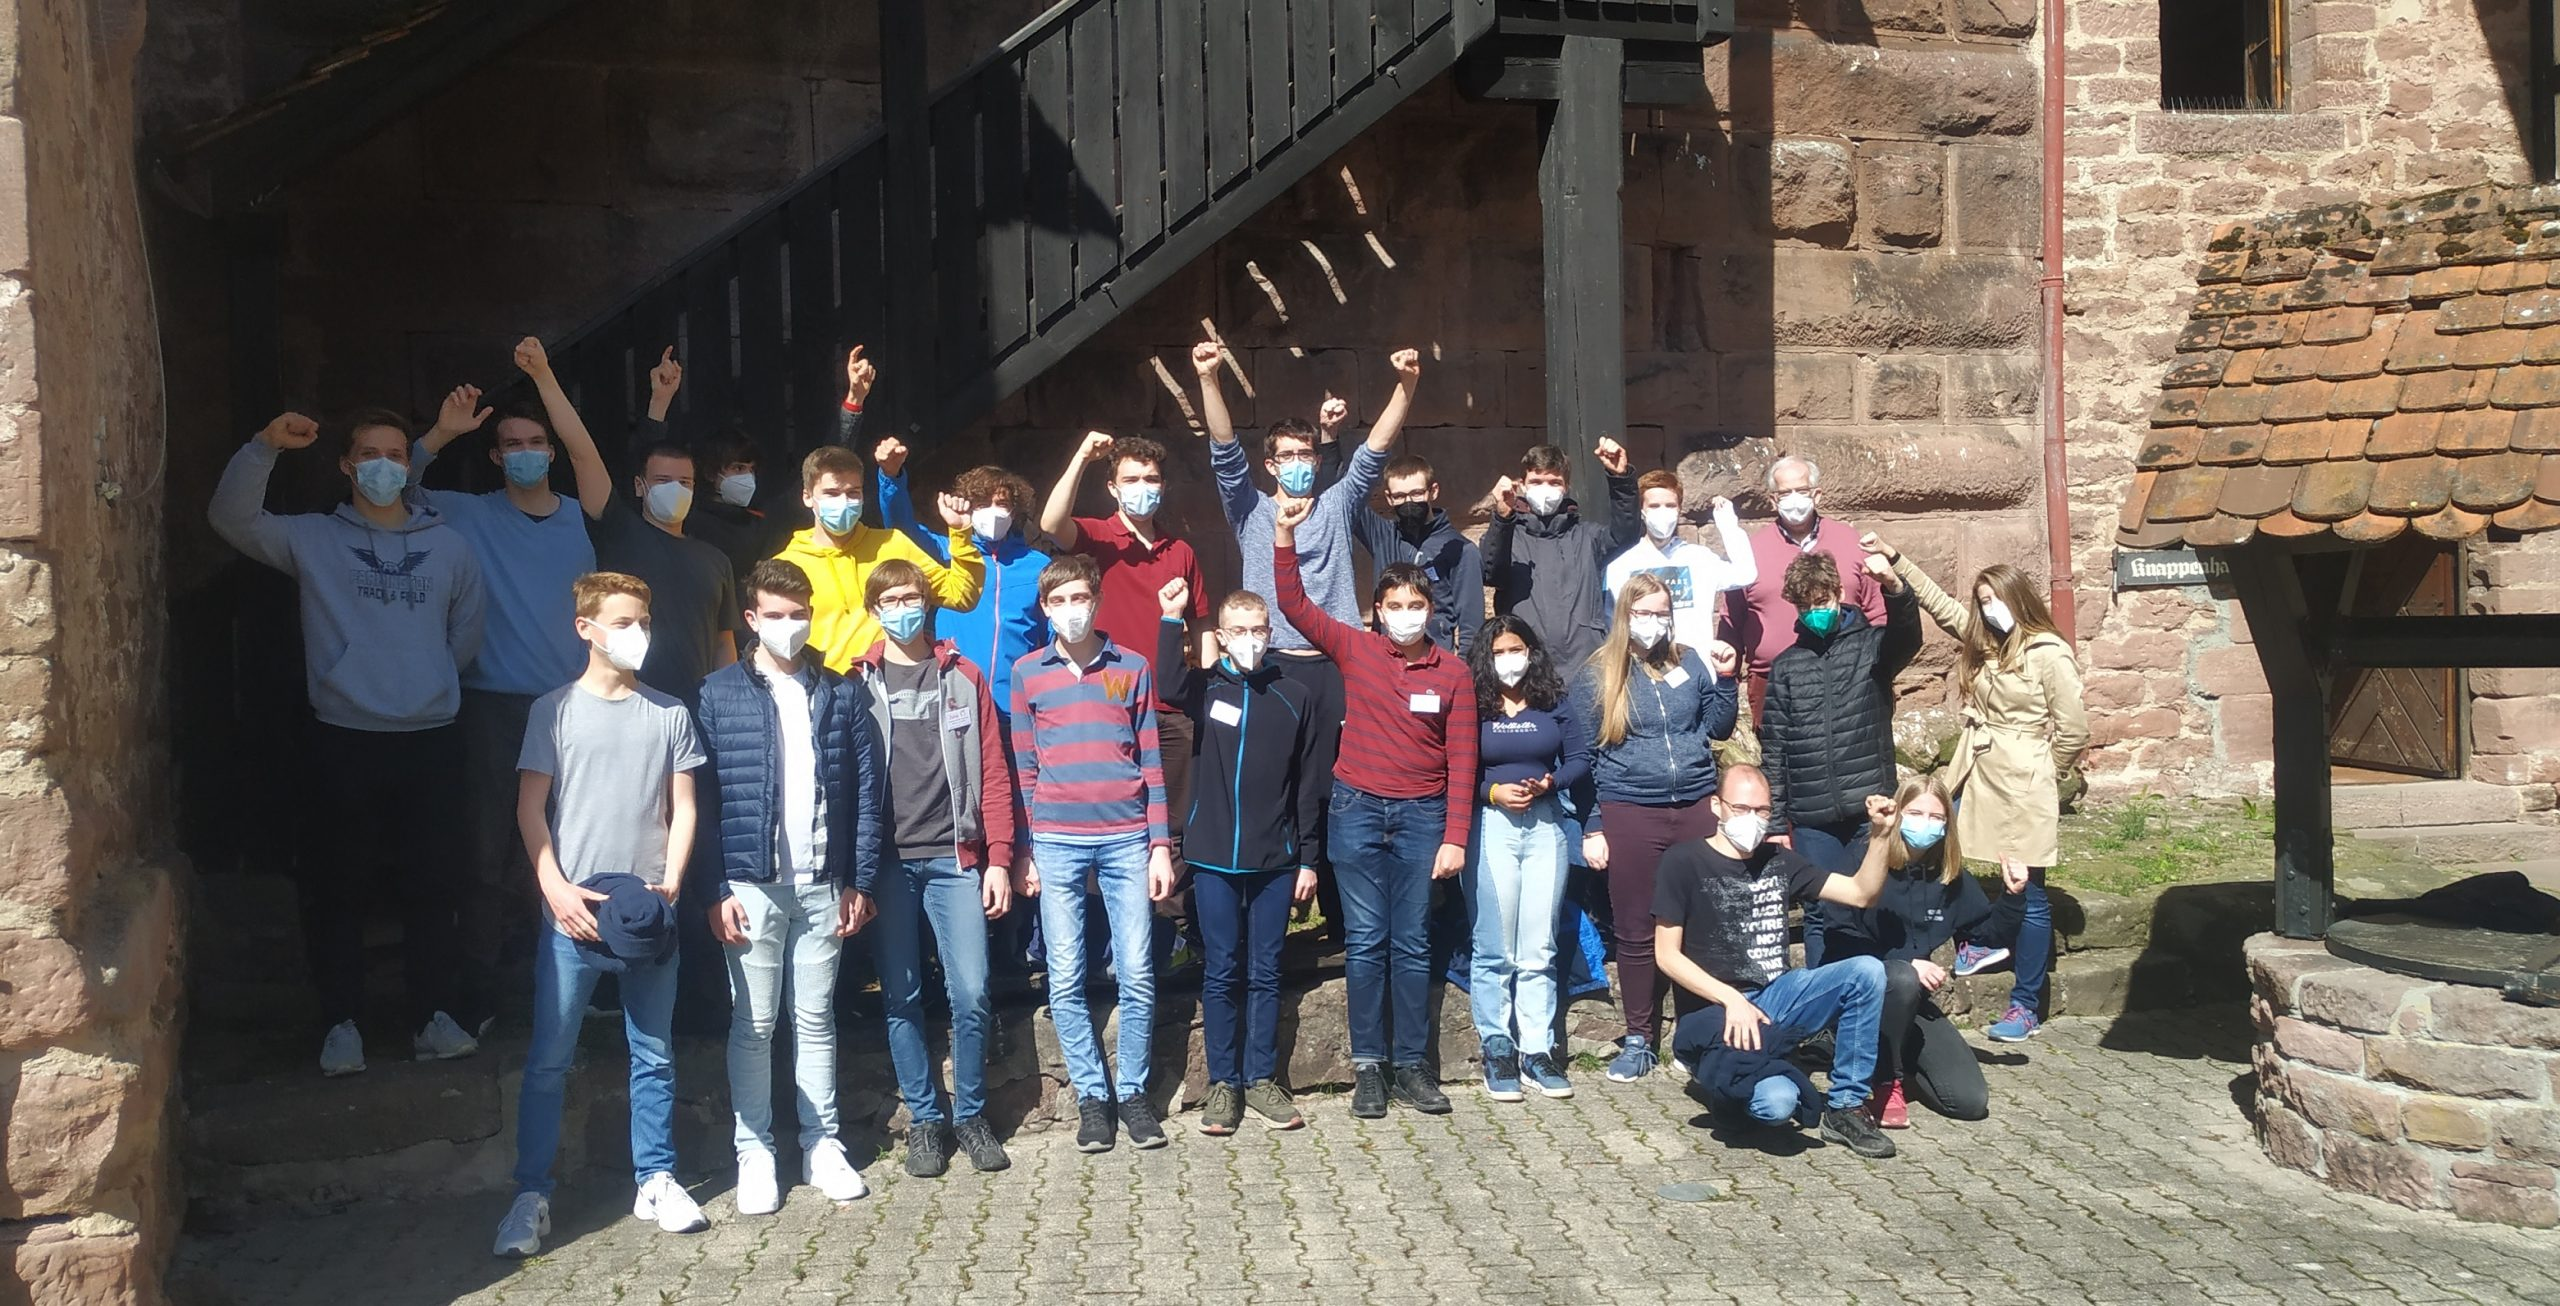 Jugendforum Informatik 1